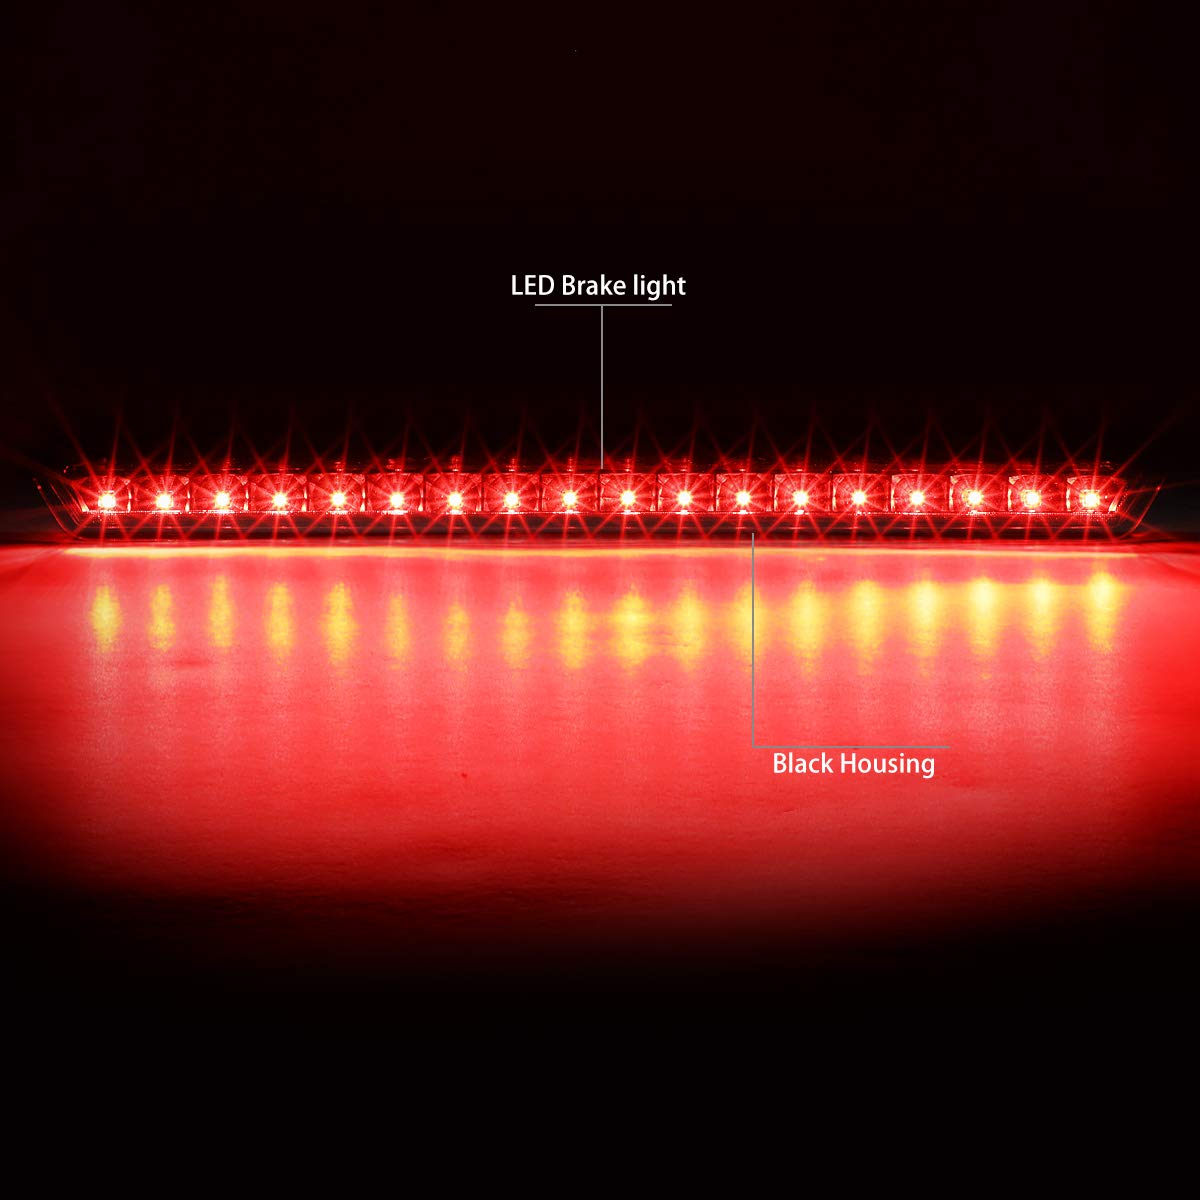 Amazon.com: DNA Motoring 3BL-GMCD15-LED-BK 3D LED Bar 3rd Third Brake Lamp/Light: Automotive